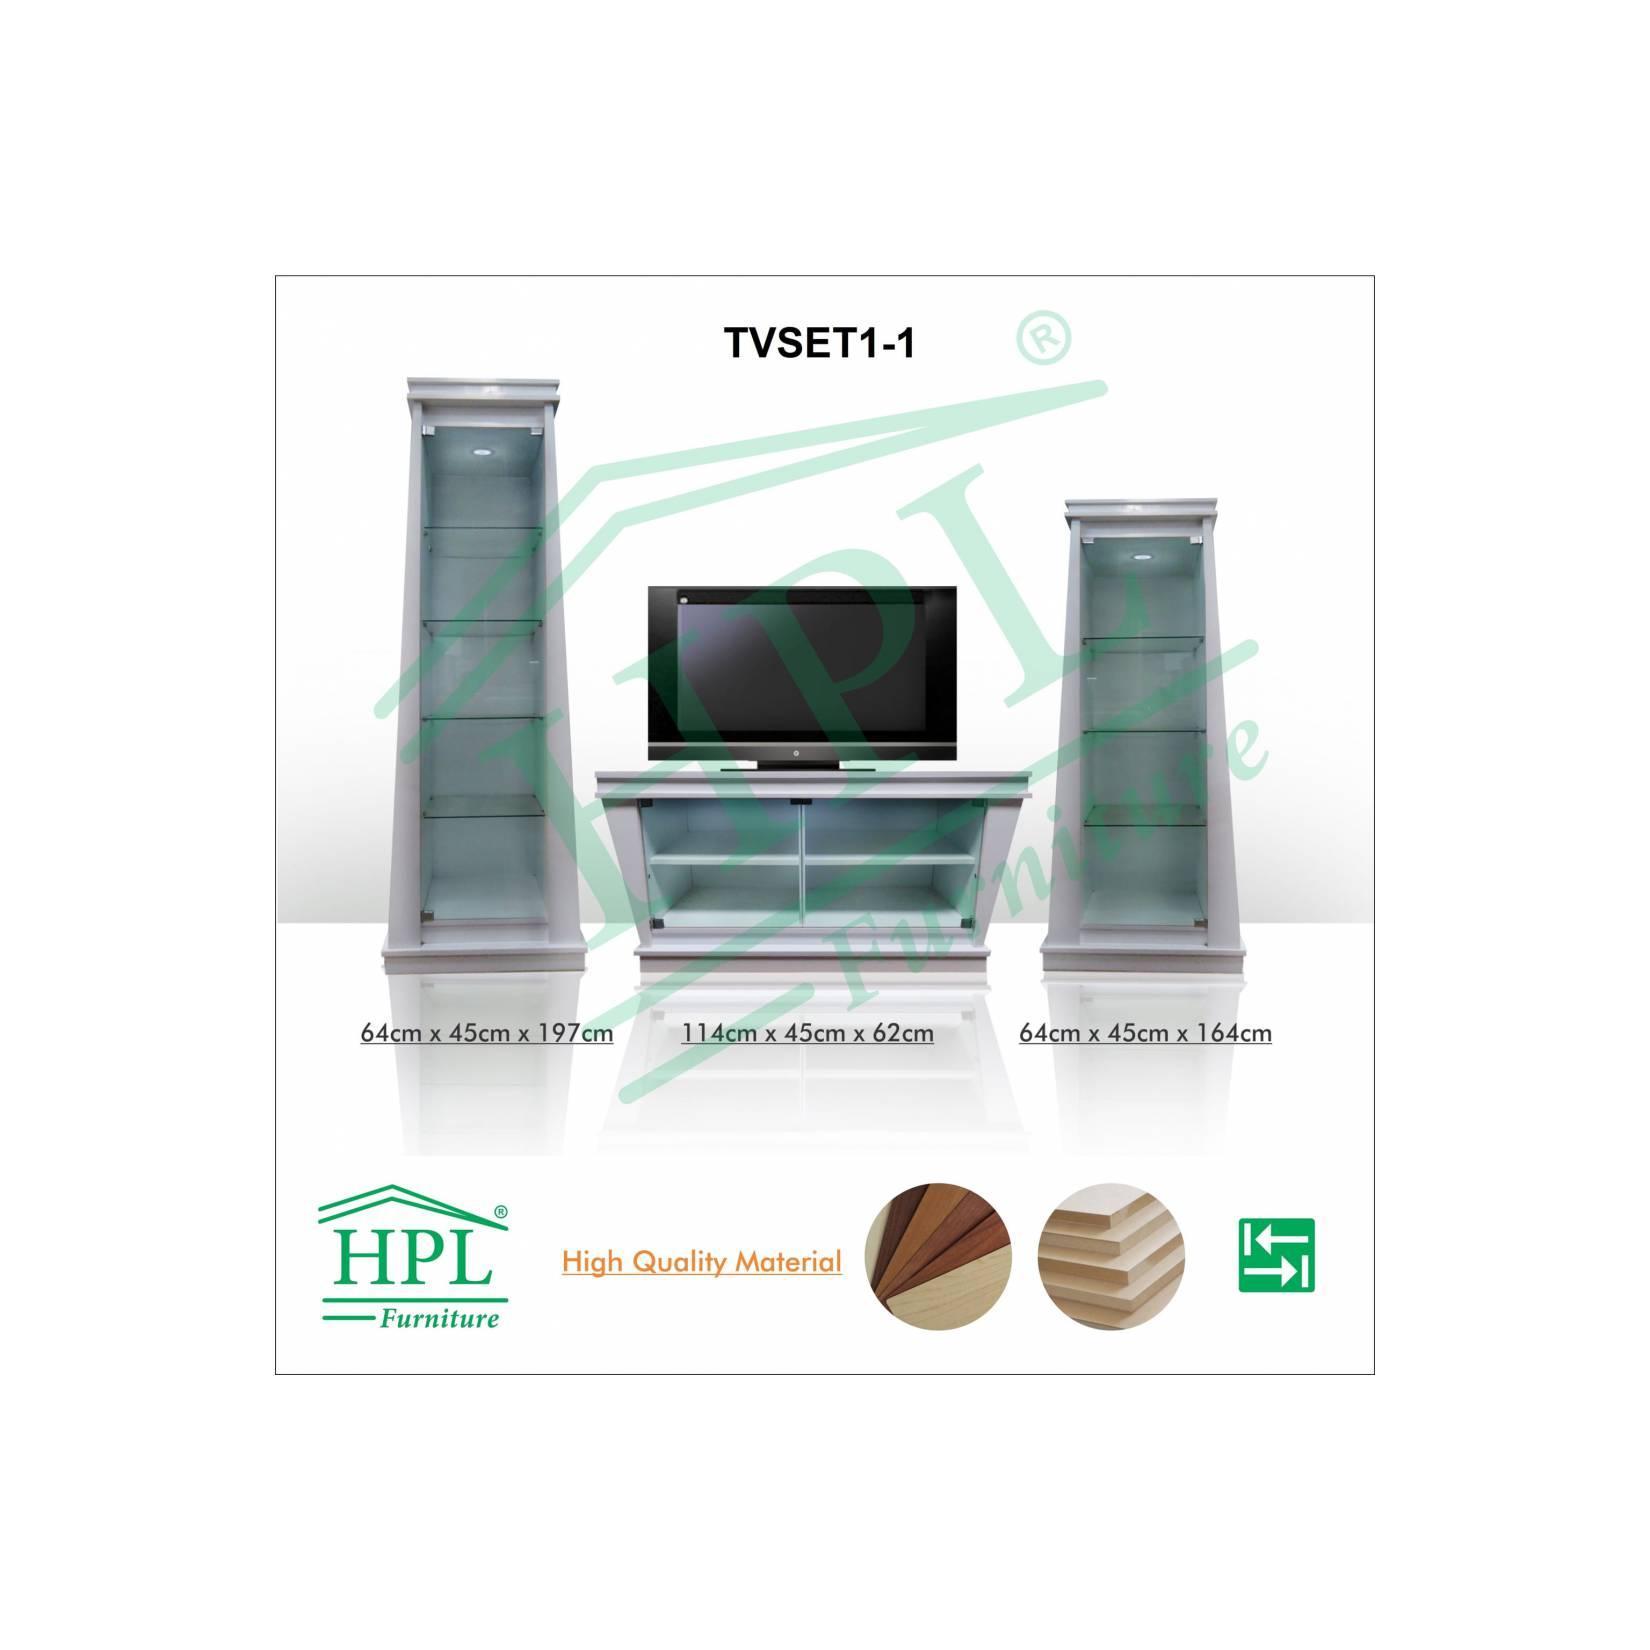 MEJA TV SET 3in1 HPL-TVSET01